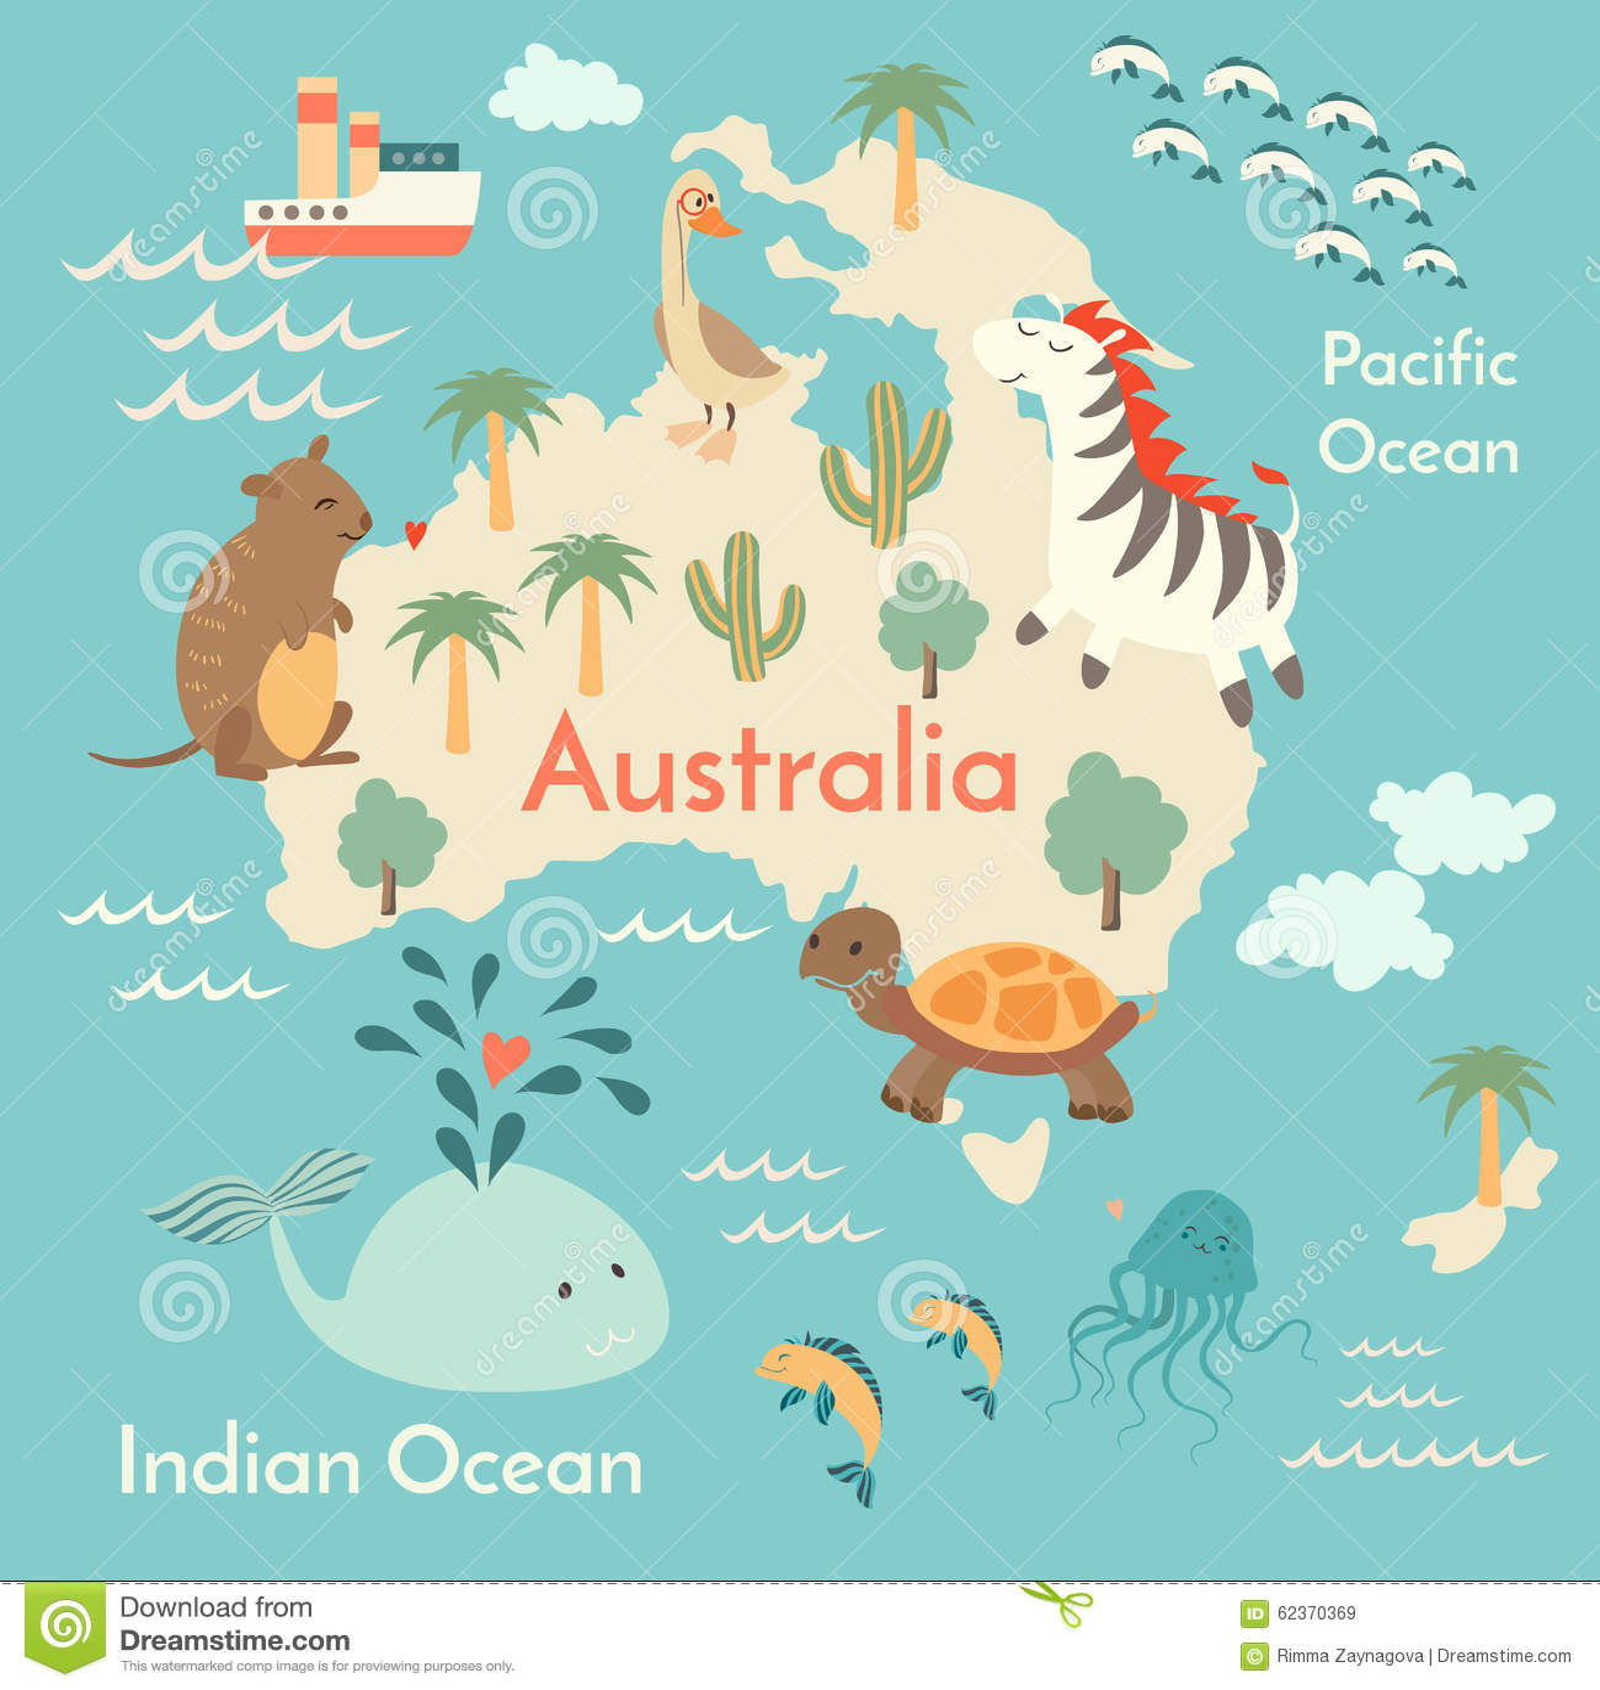 Maps Update 20001193 Australia in World Map Australia location – Australia Location on World Map